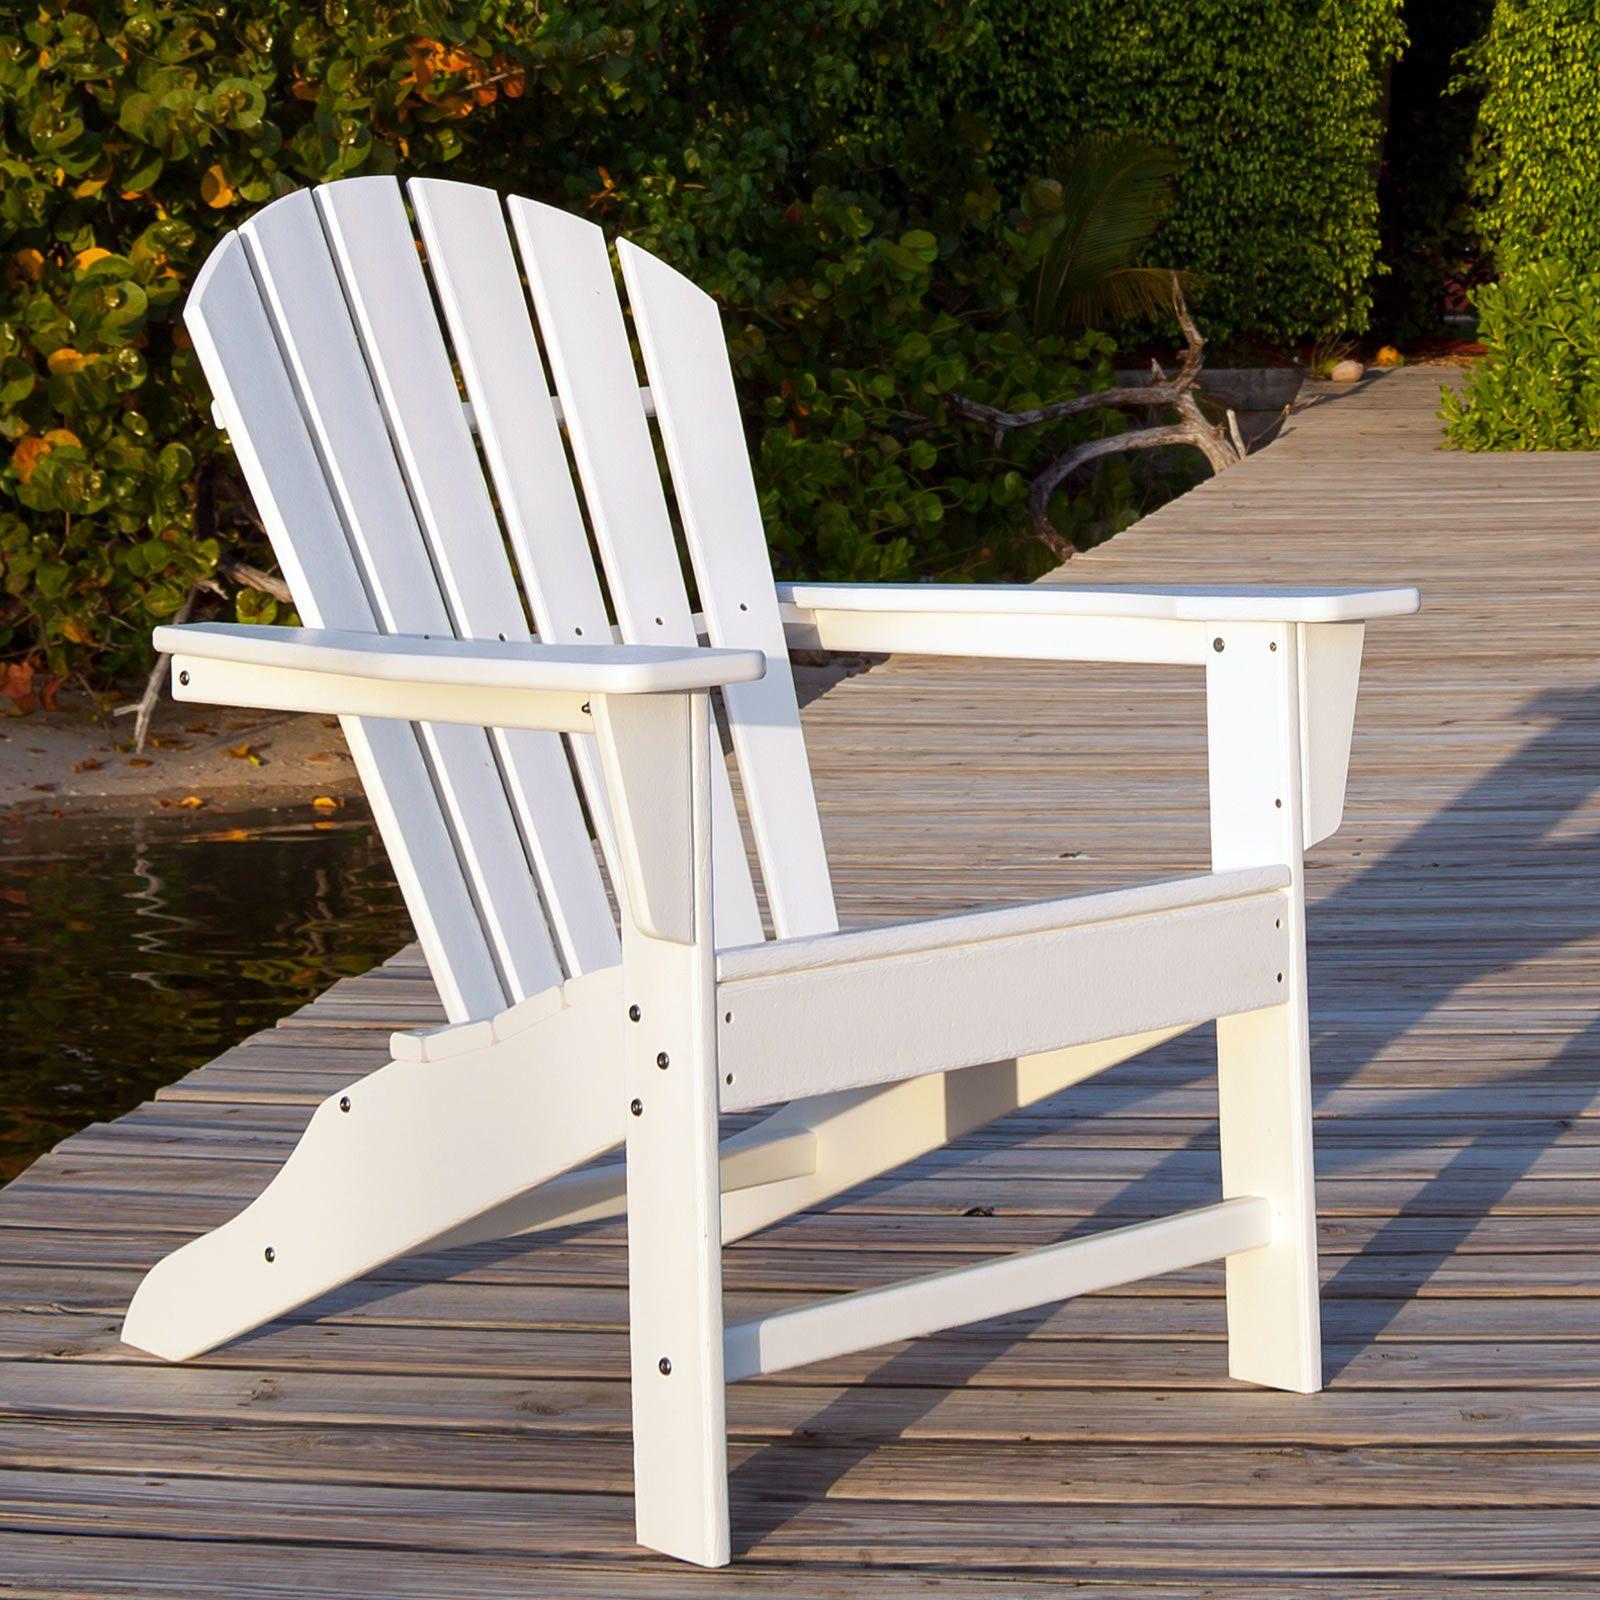 Polywood South Beach Adirondack Chair Poly Adirondack Chairs Adirondacks Beach Adirondack Chairs Recycled Plastic Adirondack Chairs Adirondack Chair [ 1600 x 1600 Pixel ]